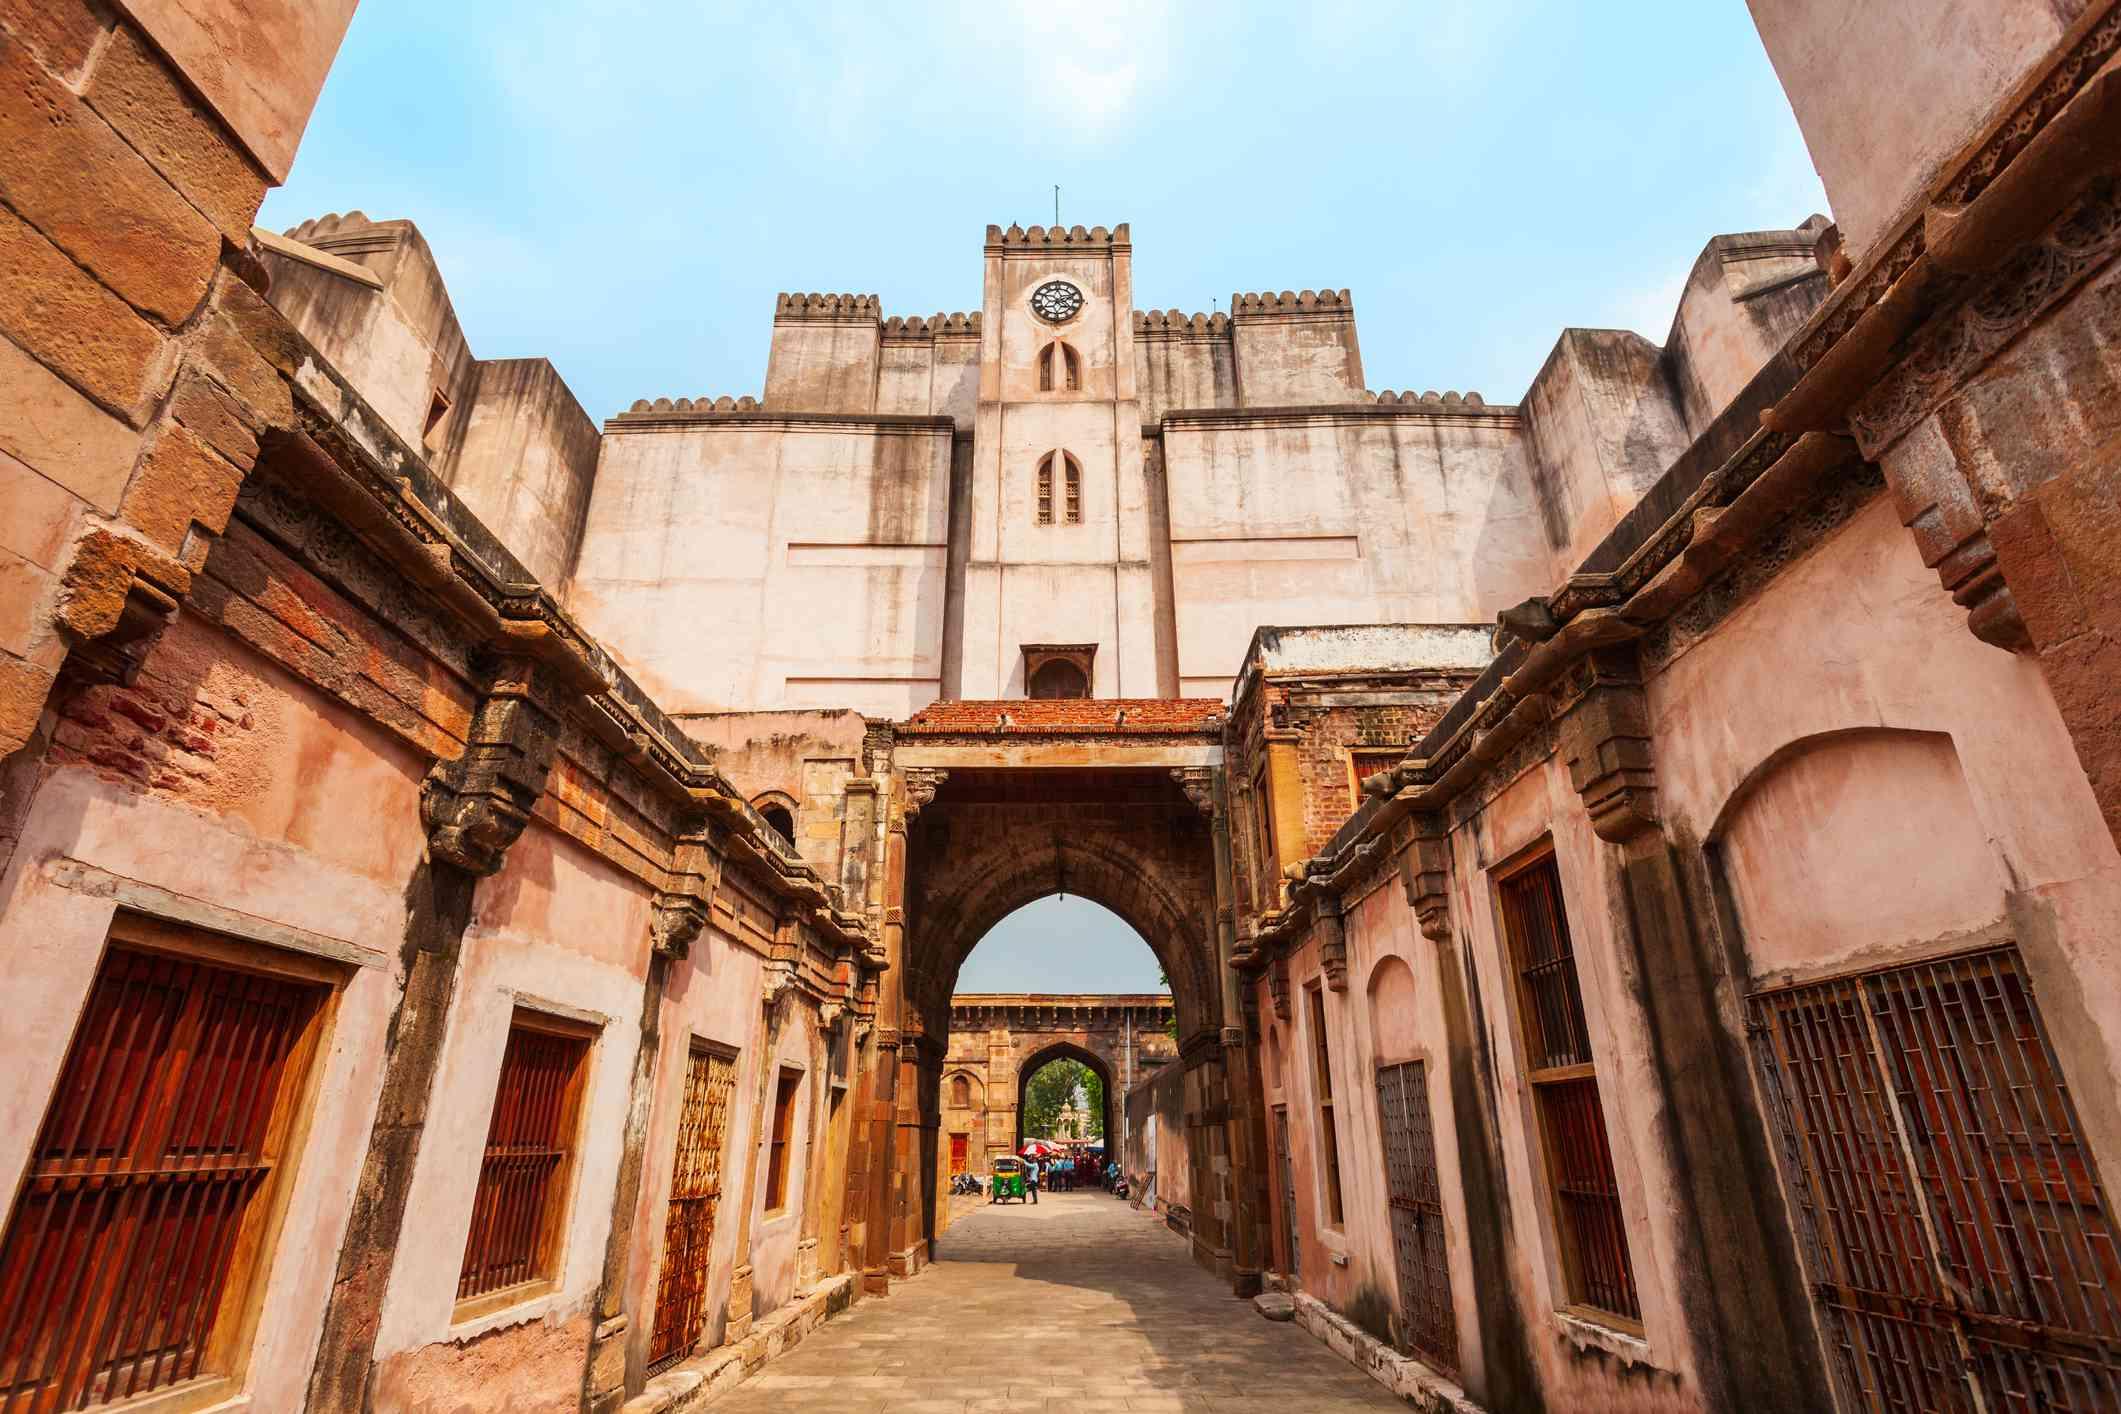 Bhadra Fort in Ahmedabad, India